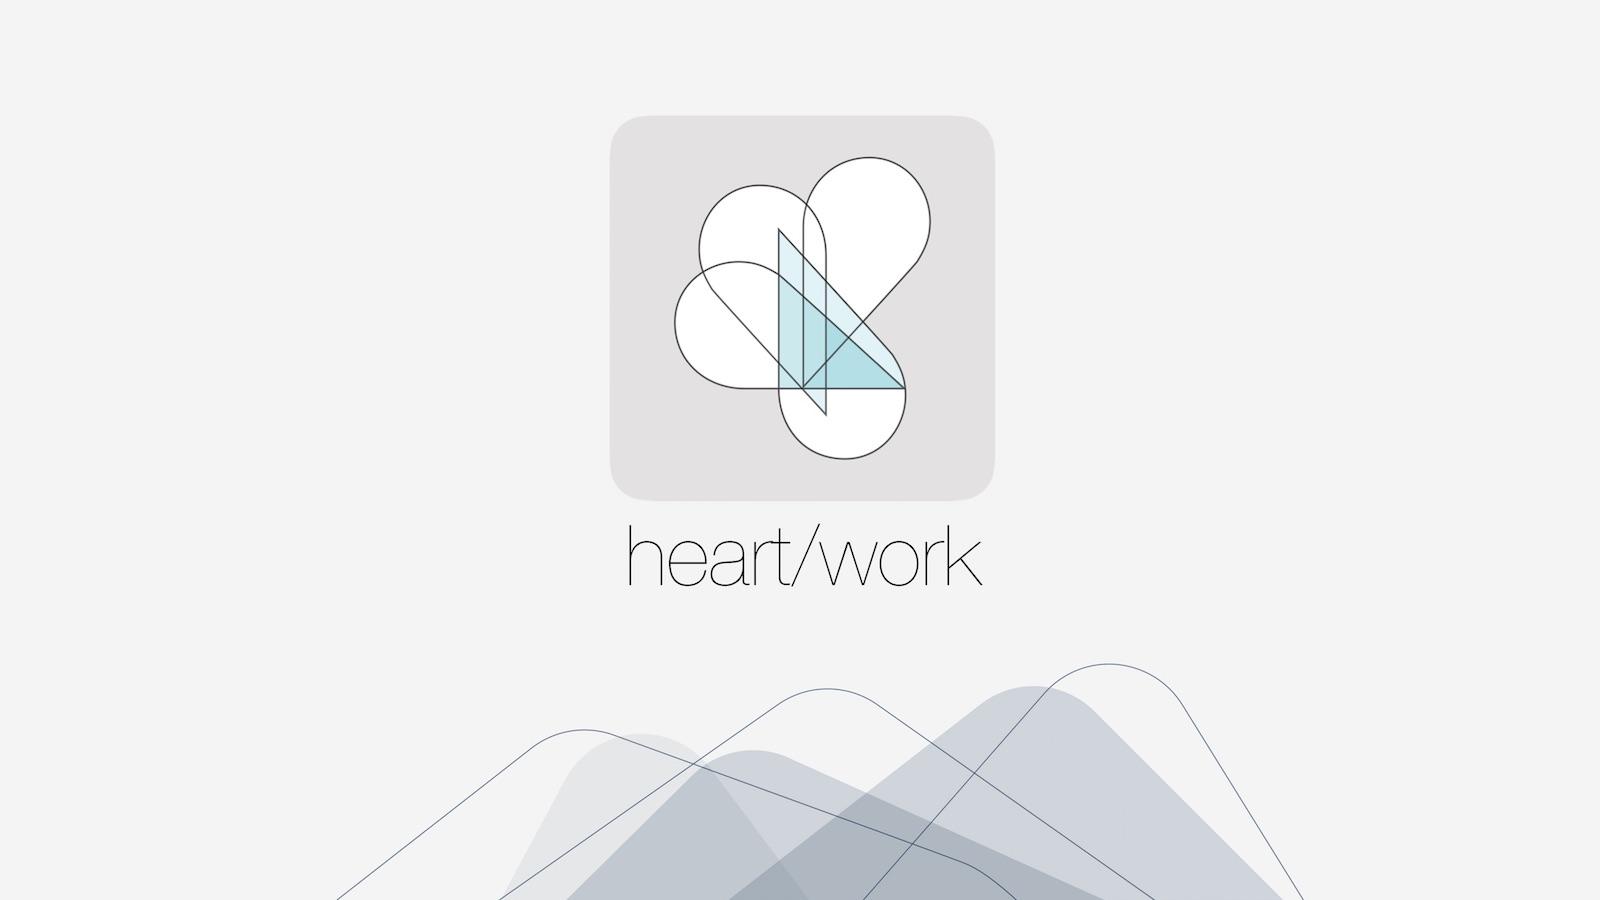 heart/work icon